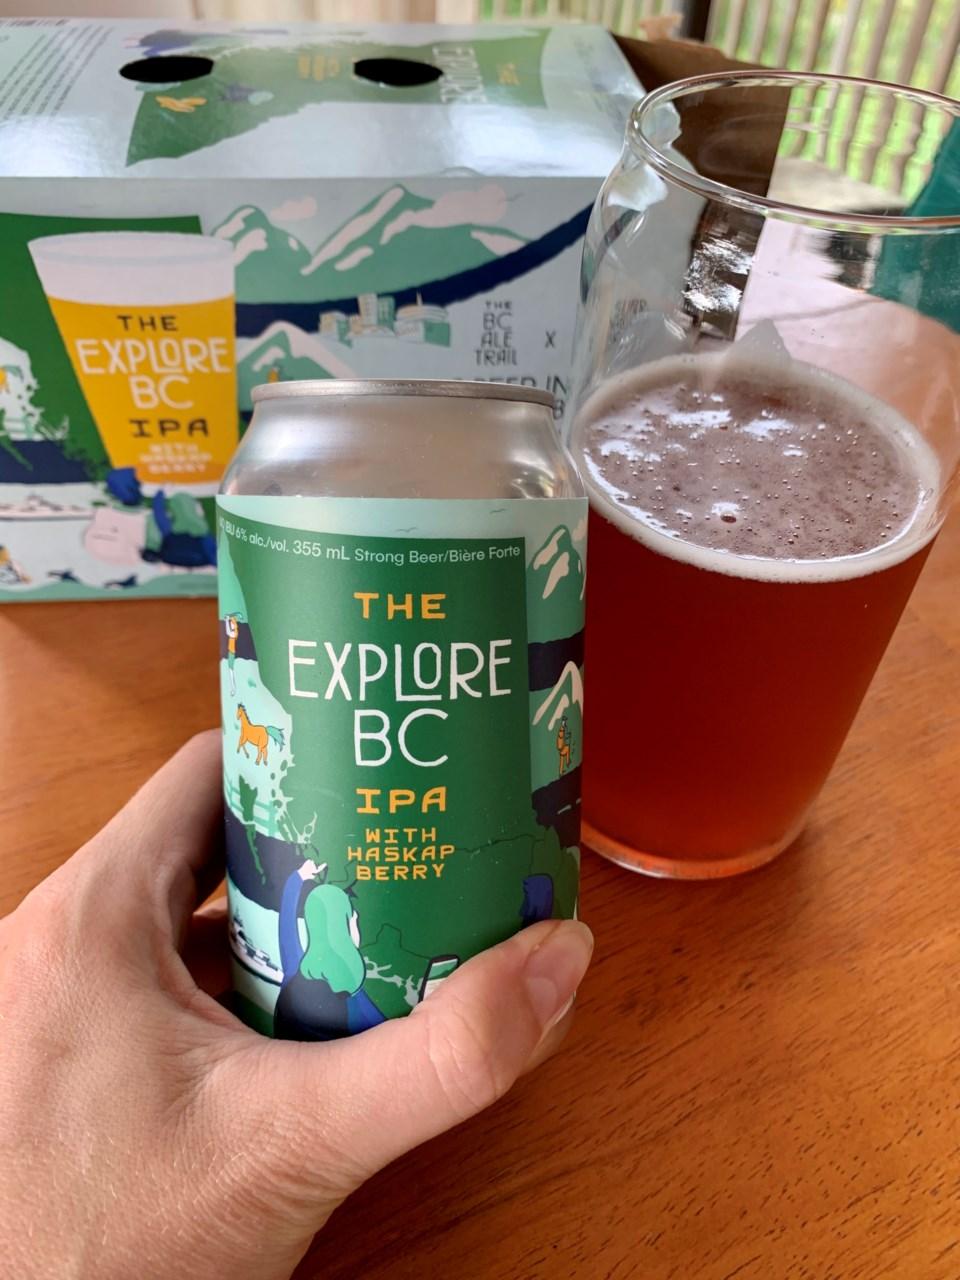 Explore BC IPA